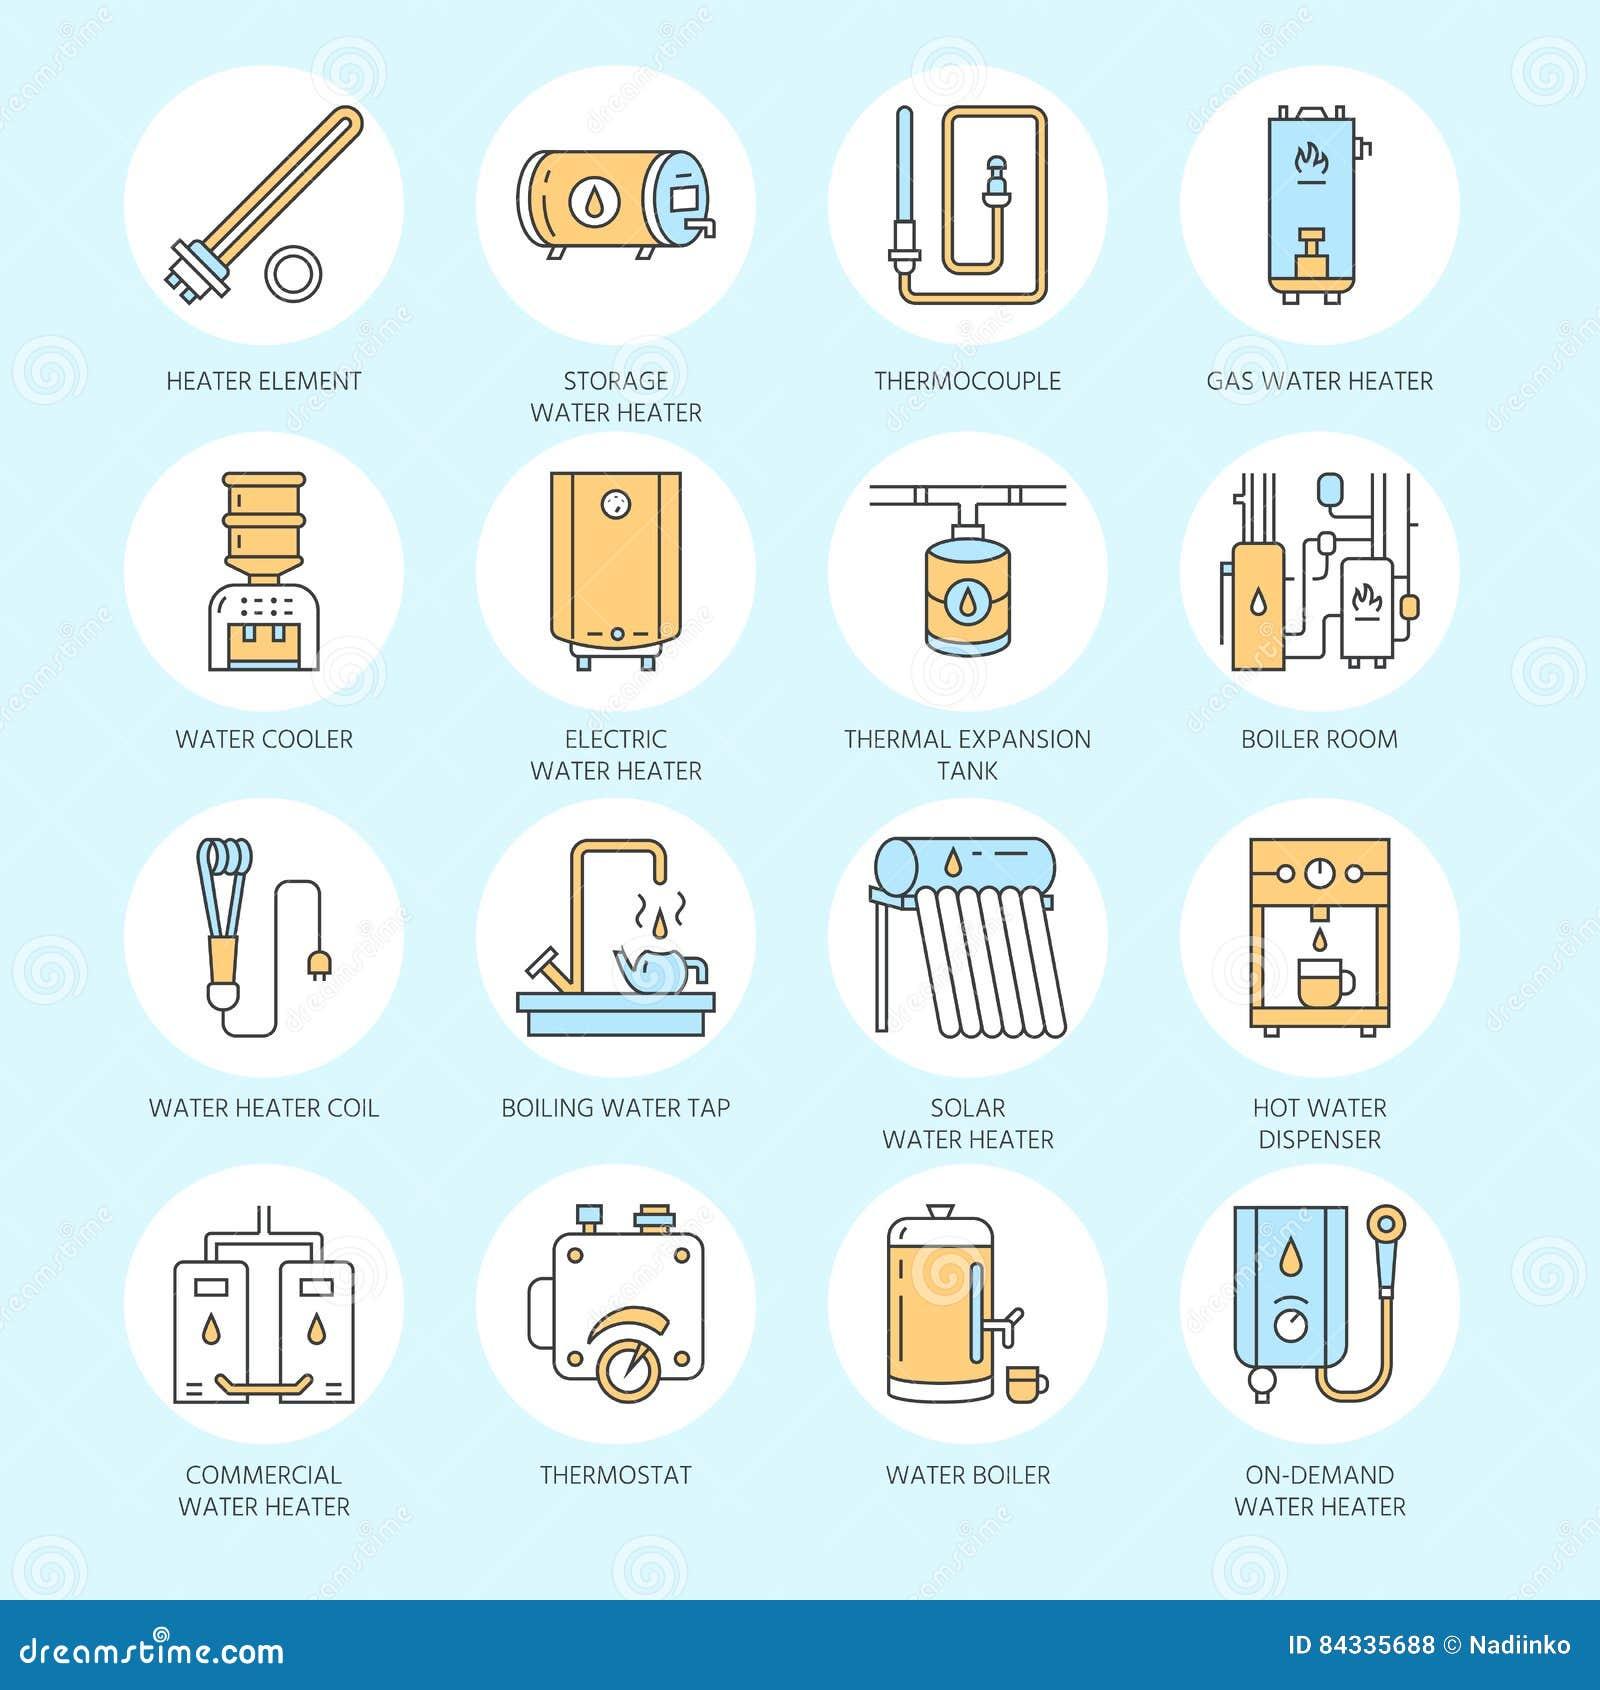 O aquecedor de água, a caldeira, o termostato, bondes, gás, calefatores solares e o outro equipamento de aquecimento da casa alin